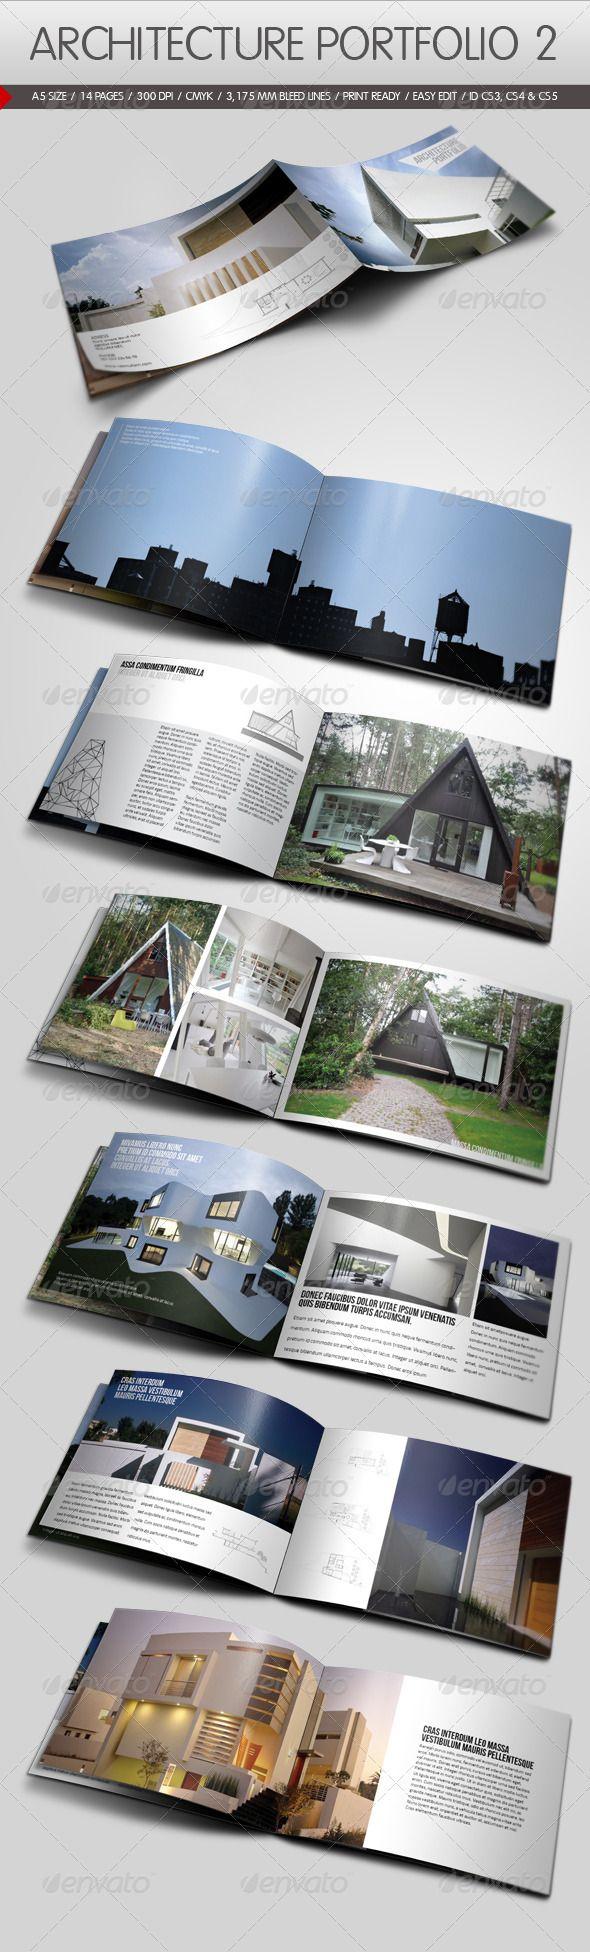 The 25+ best Architecture portfolio ideas on Pinterest